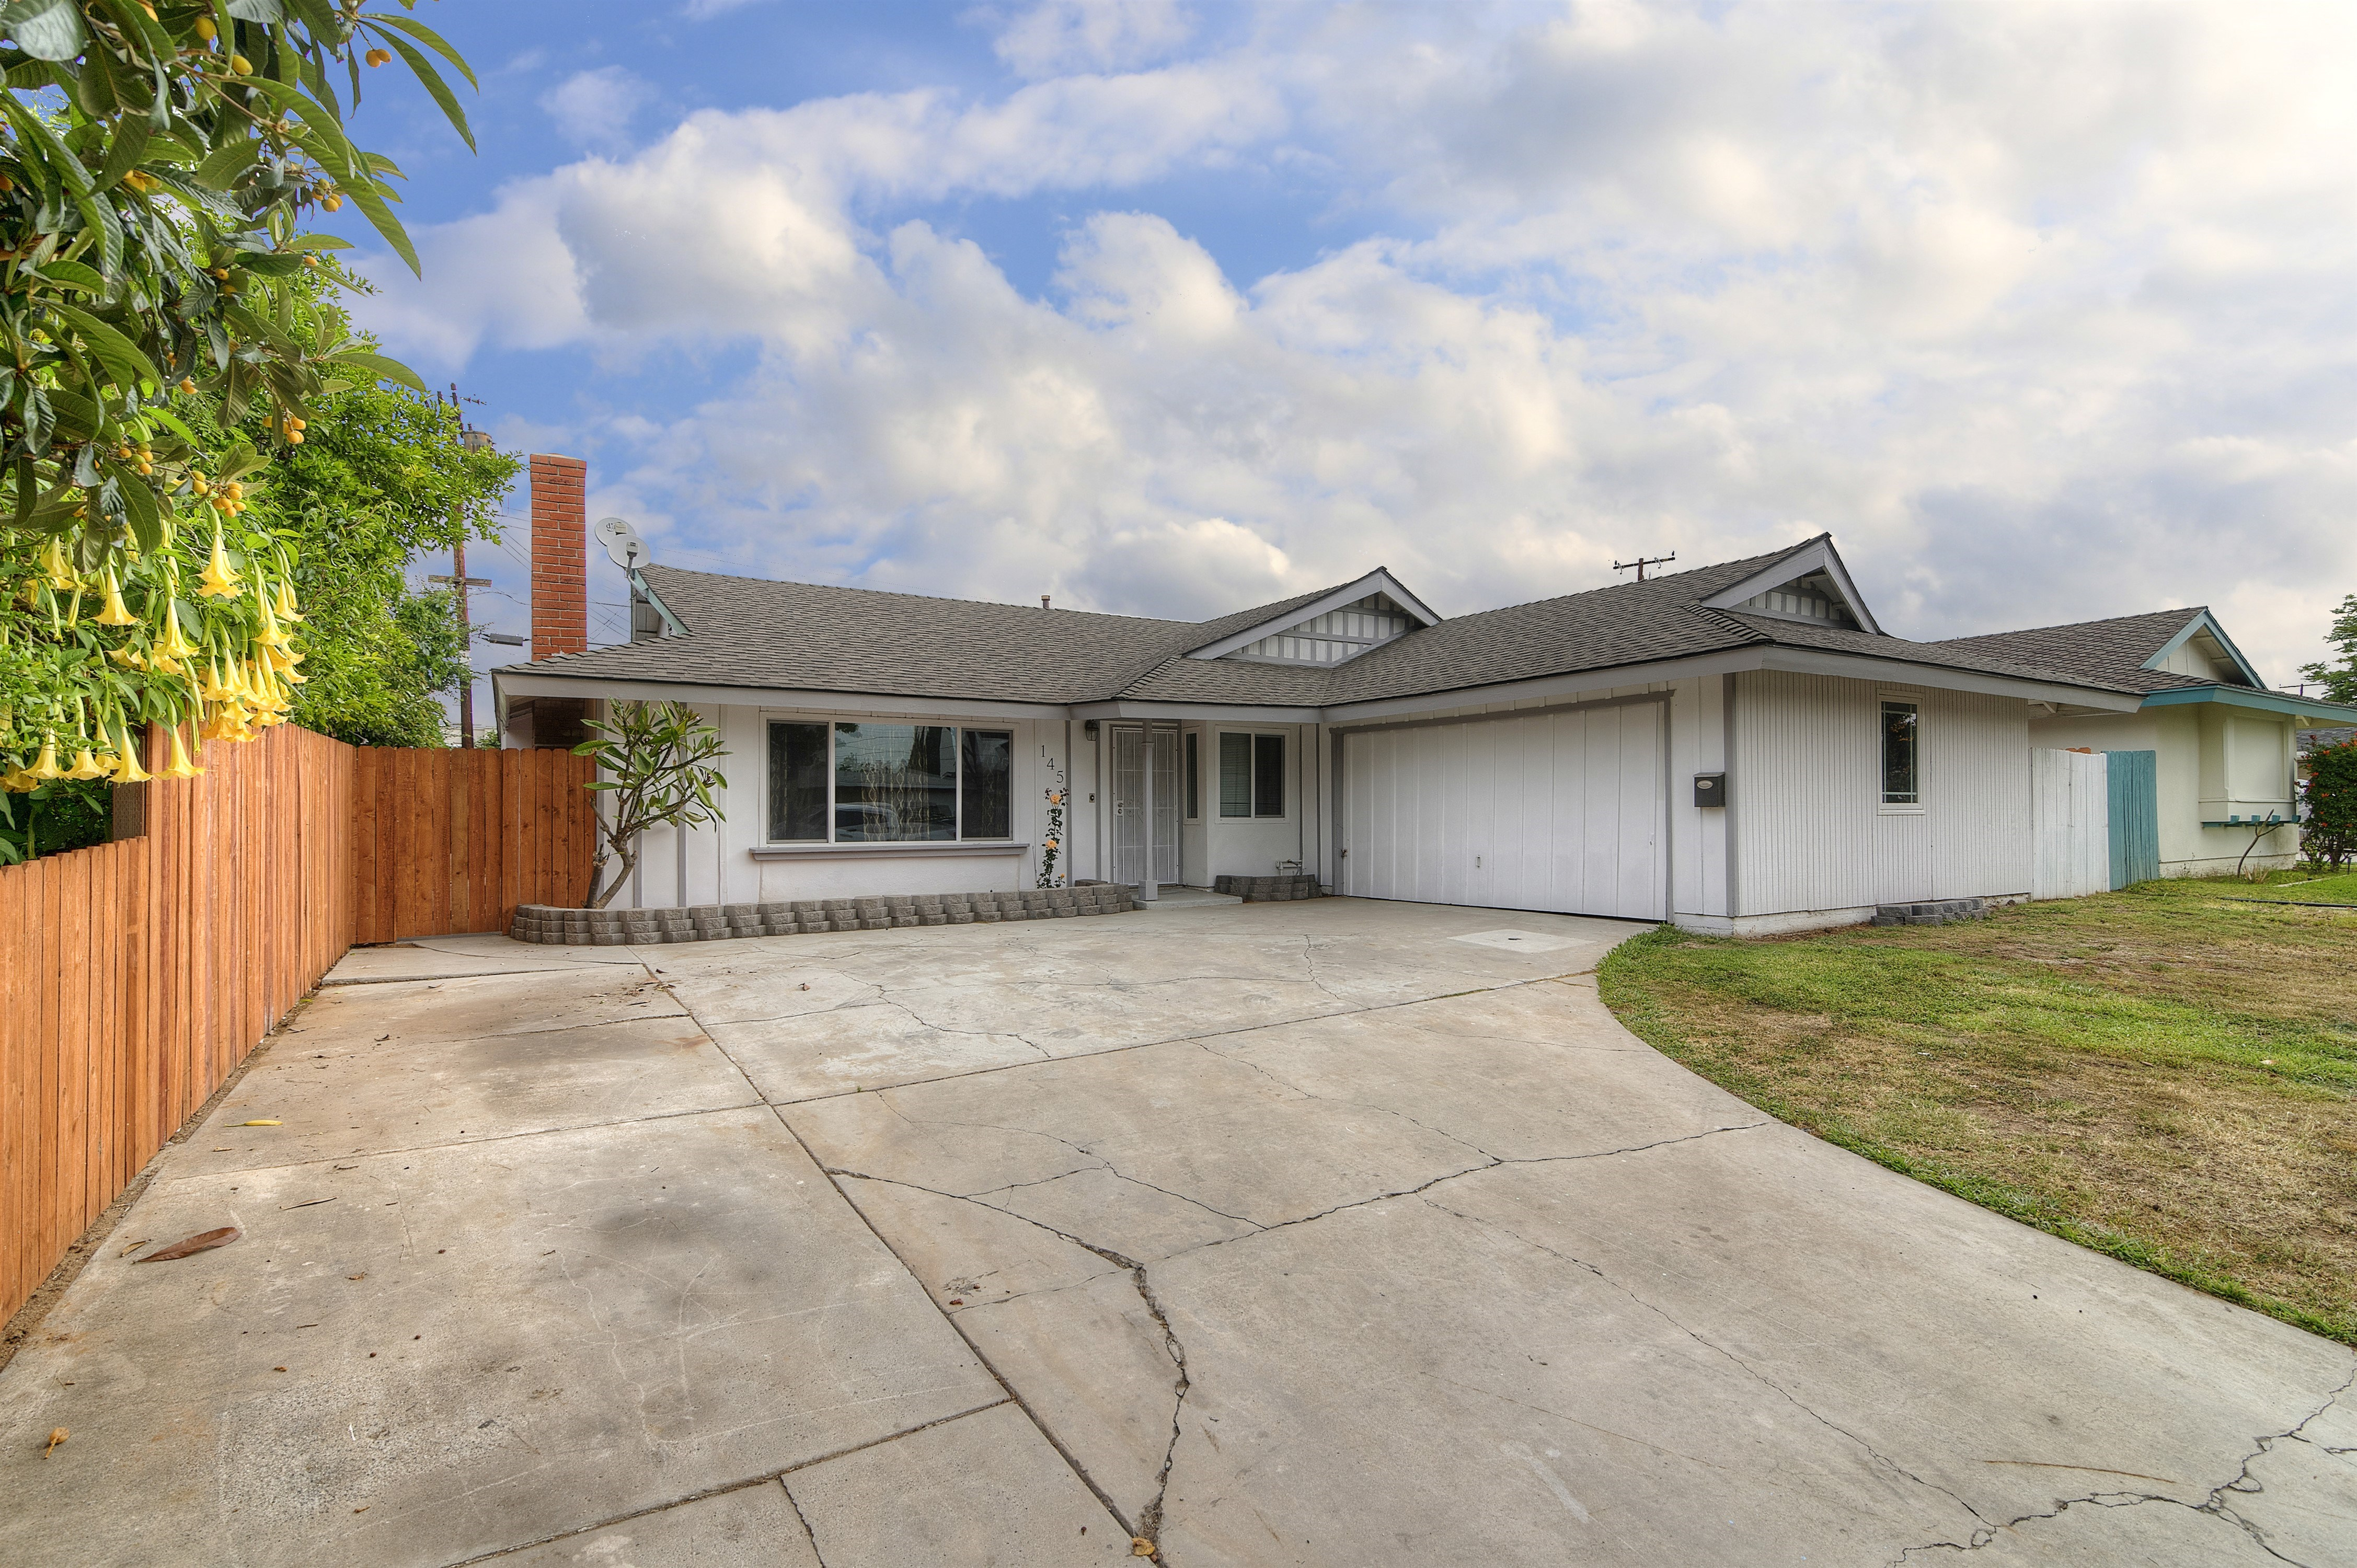 145 E. Hoover Avenue Orange, Ca 92867